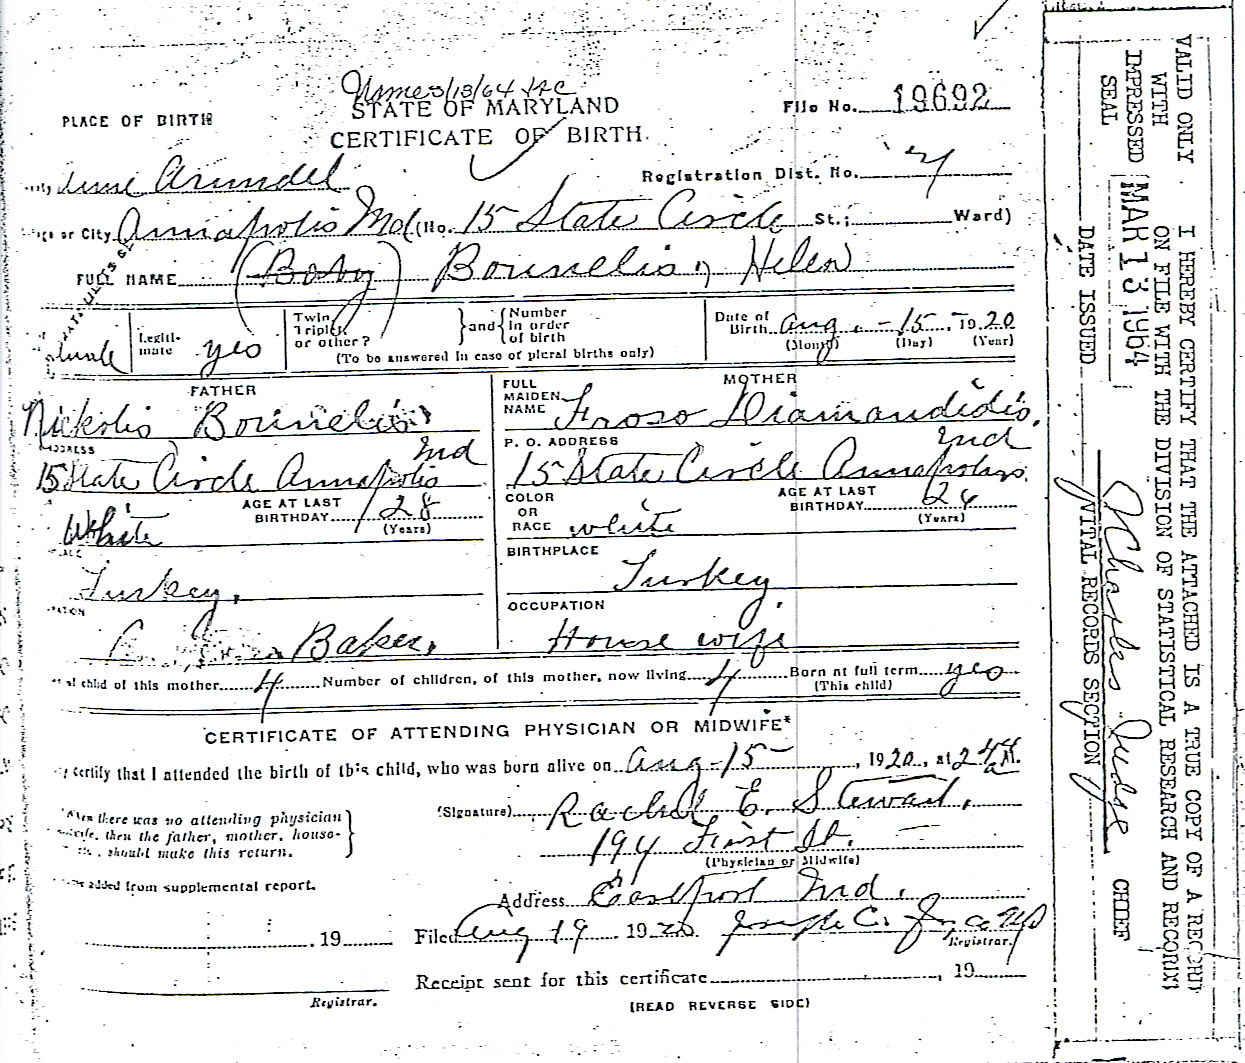 Helen Bounelis birth certificate 1920